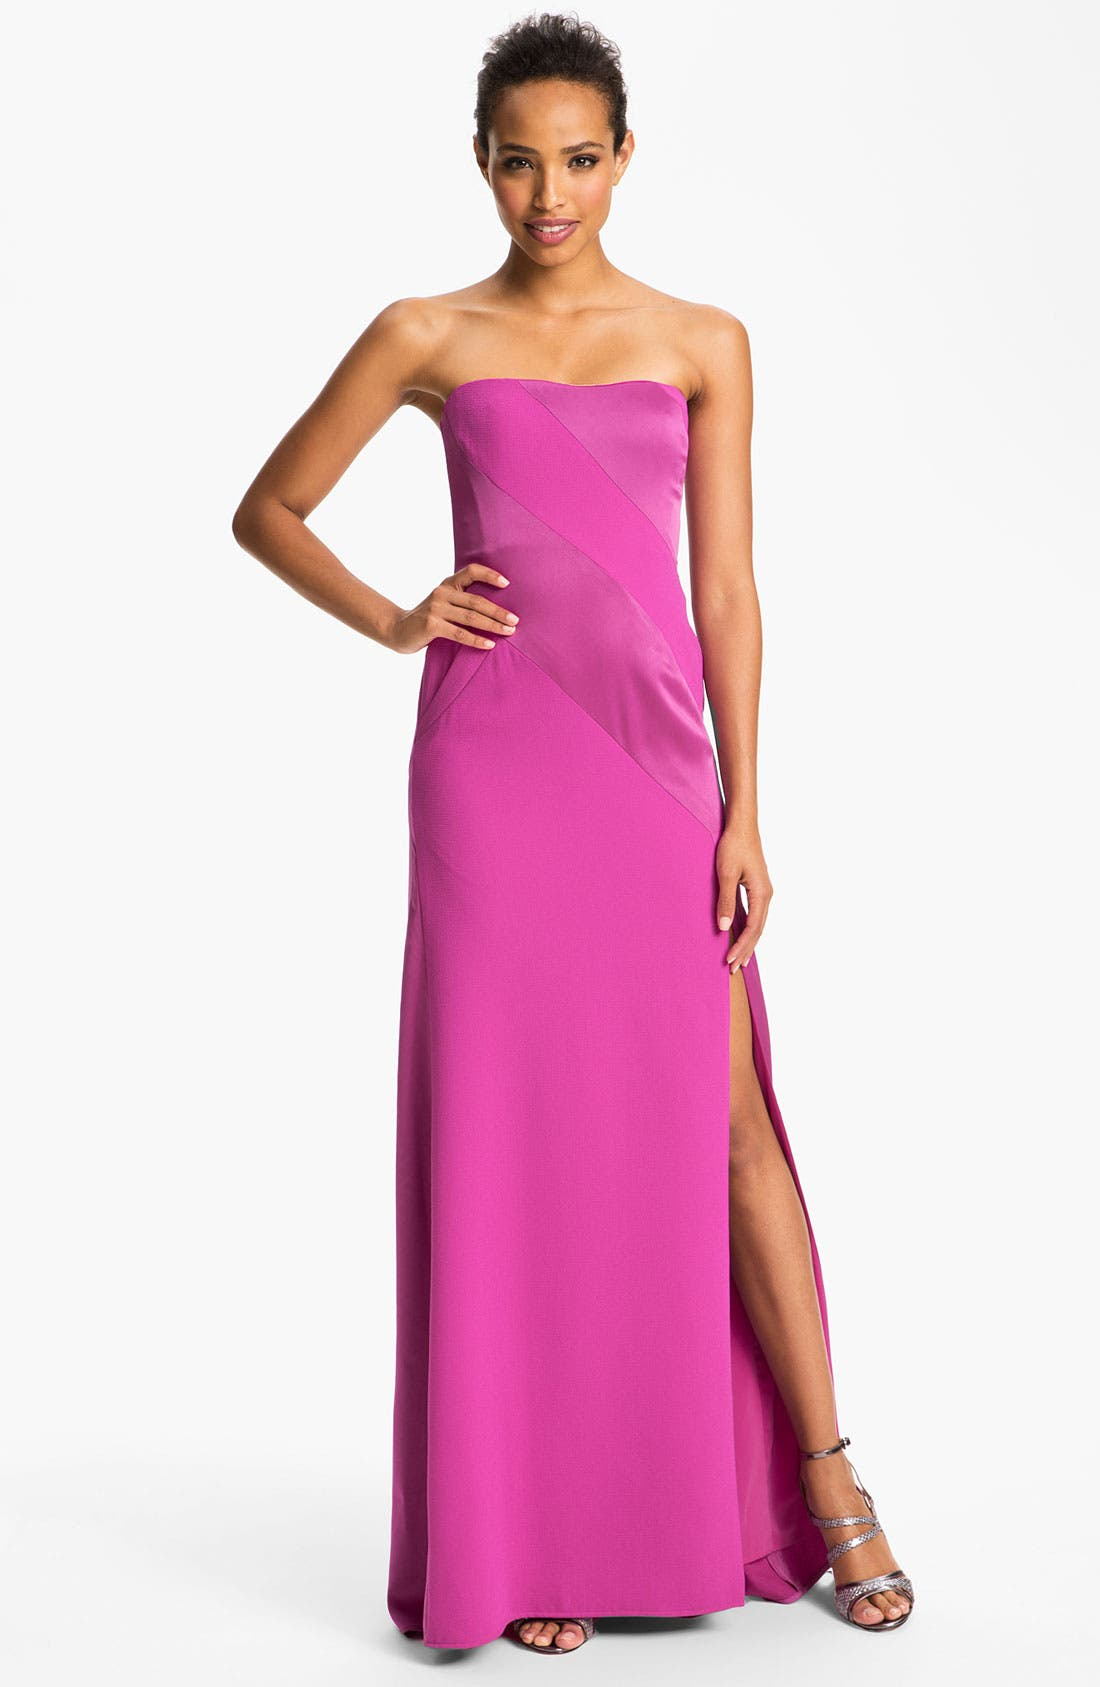 Main Image - BCBGMAXAZRIA Strapless Satin Inset Crepe Gown